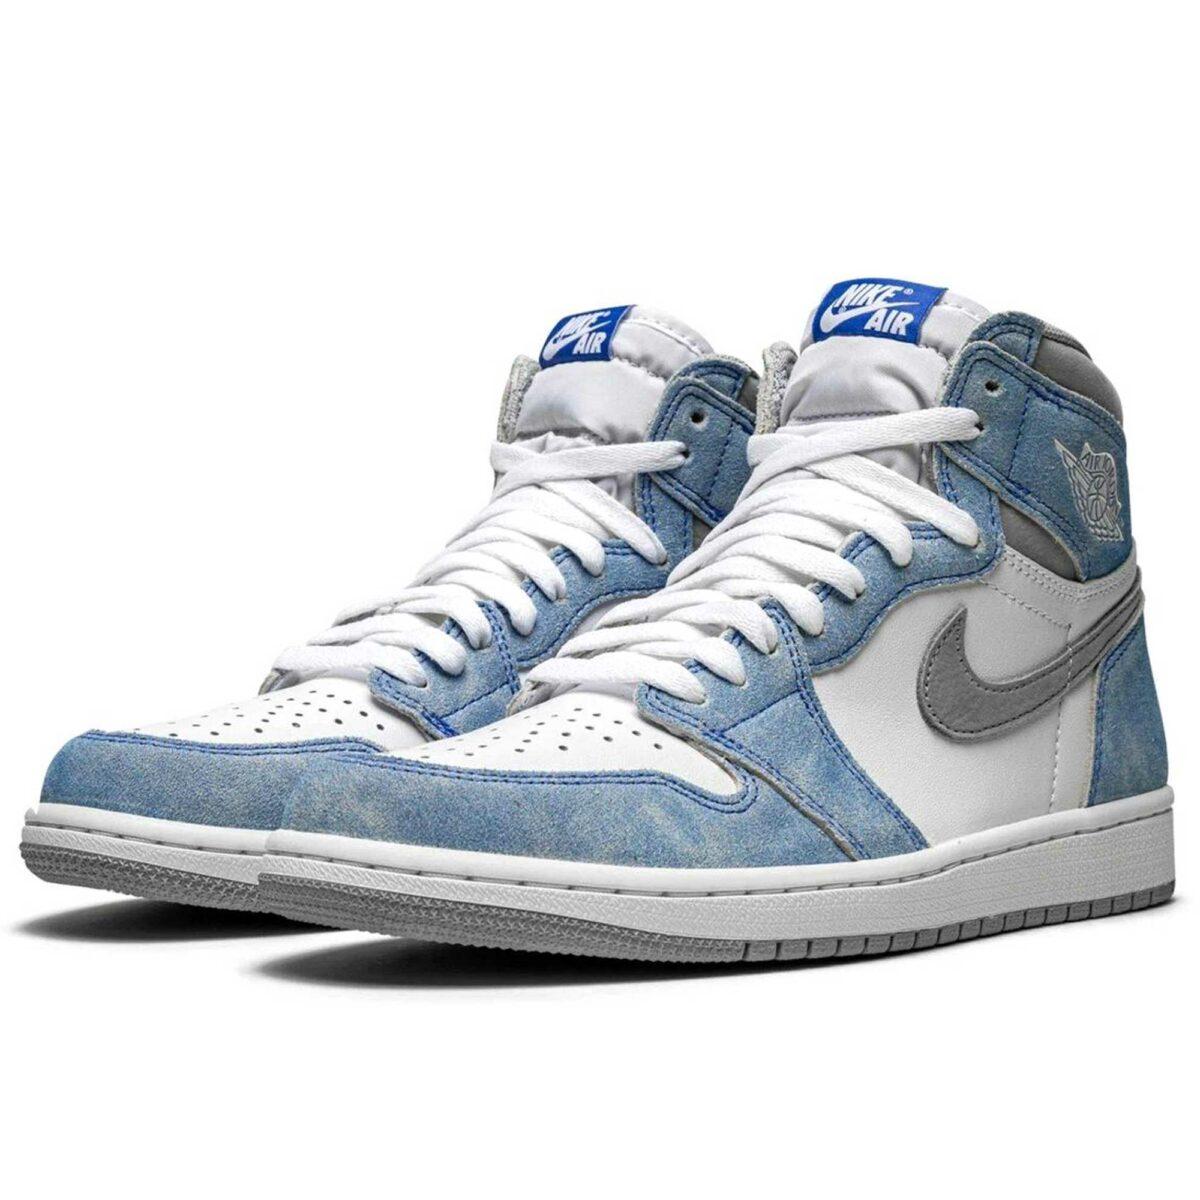 nike air Jordan 1 retro high og hyper royal 555088_402 купить